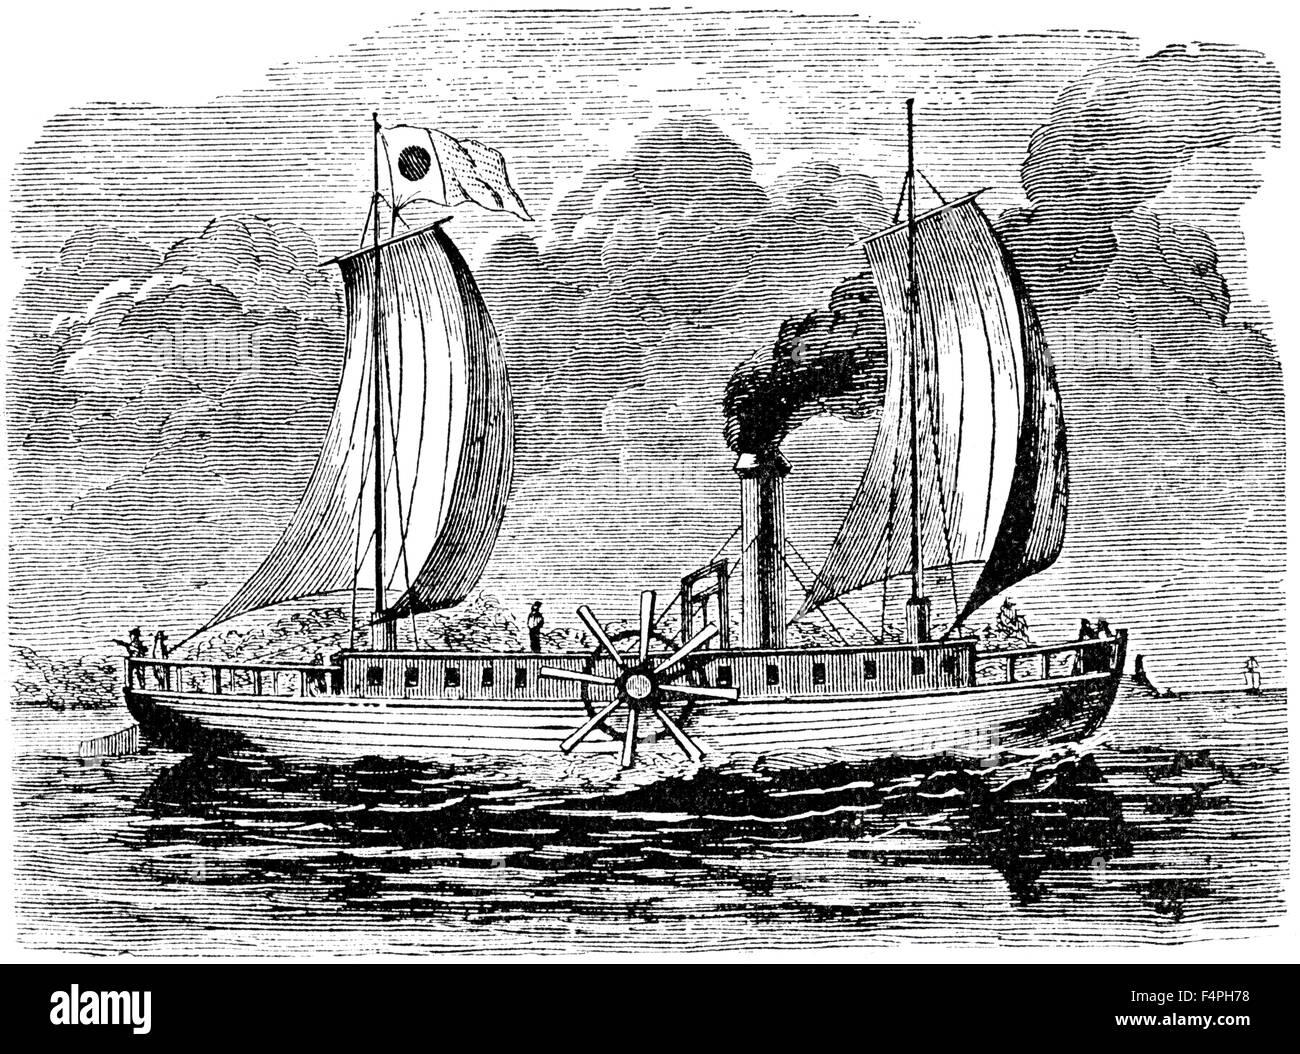 Robert Fulton S Steamboat Engraving Stock Photo